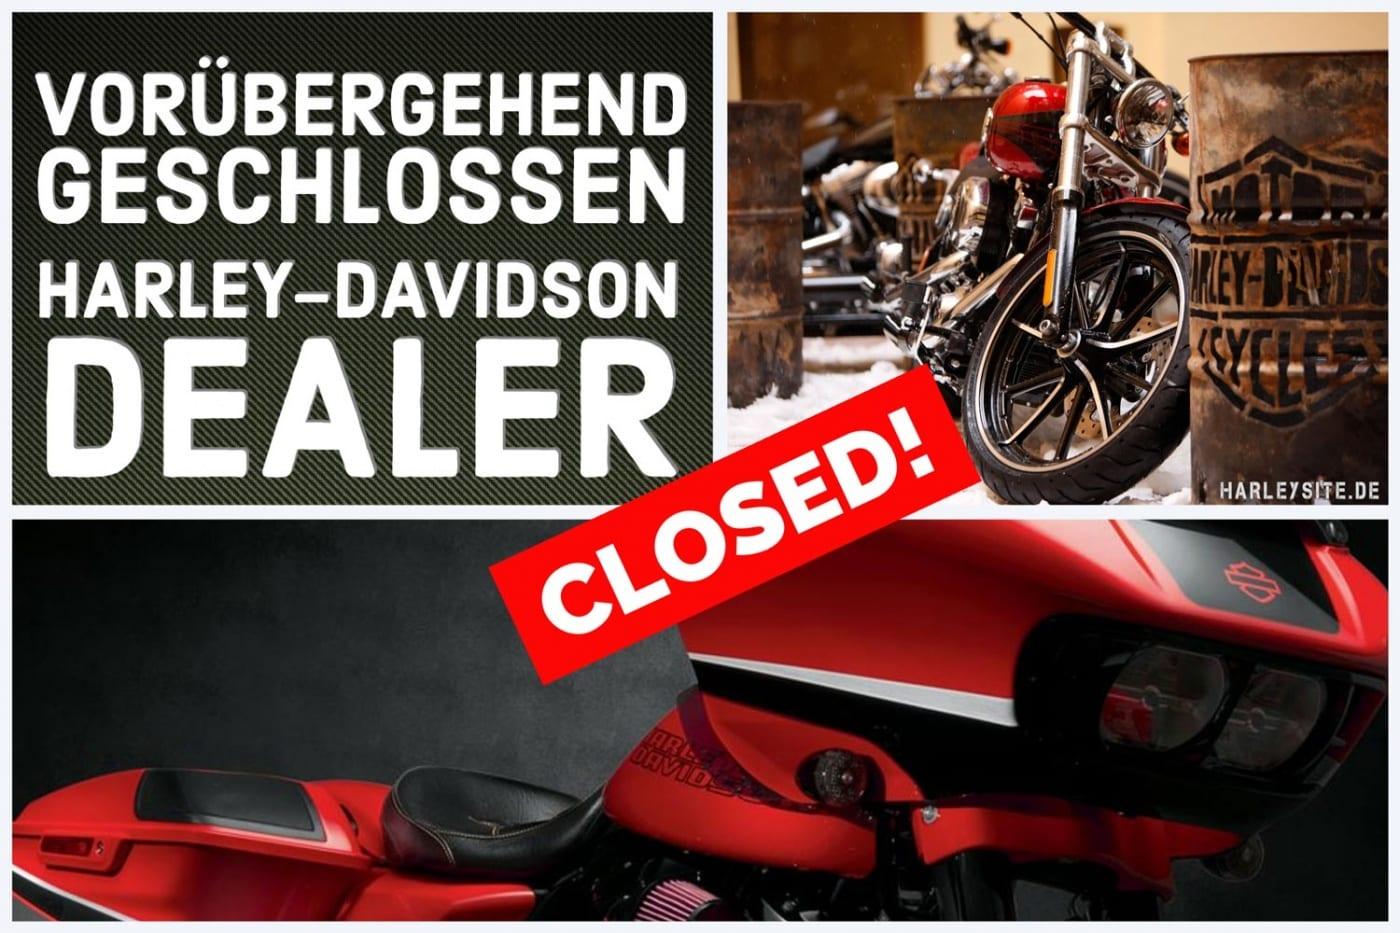 Corona-aktuell | Harley-Davidson Dealer Closed